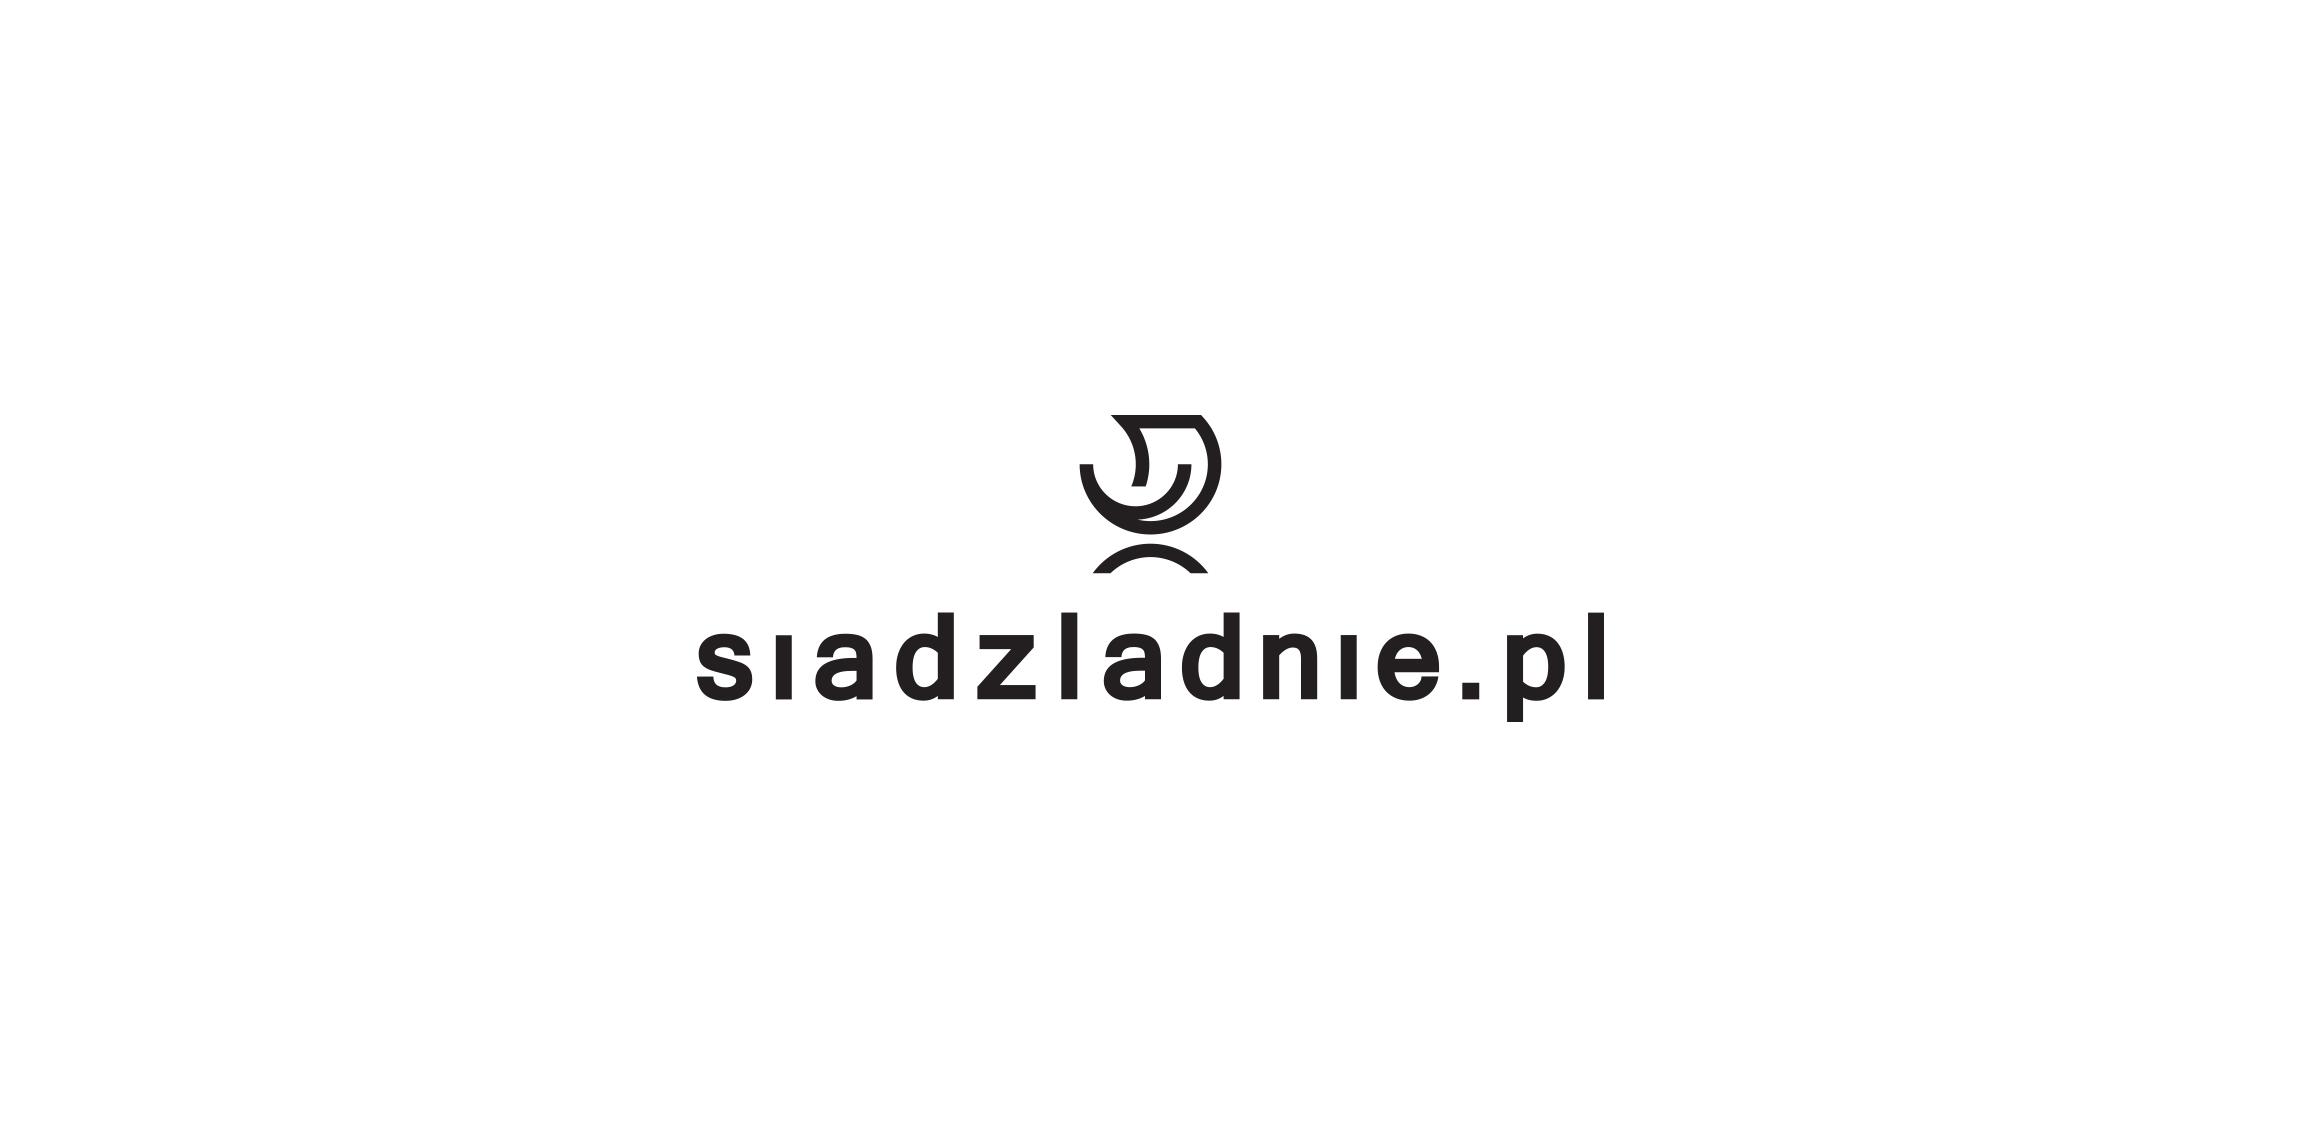 Siądźładnie.pl | LogoMoose - Logo Inspiration